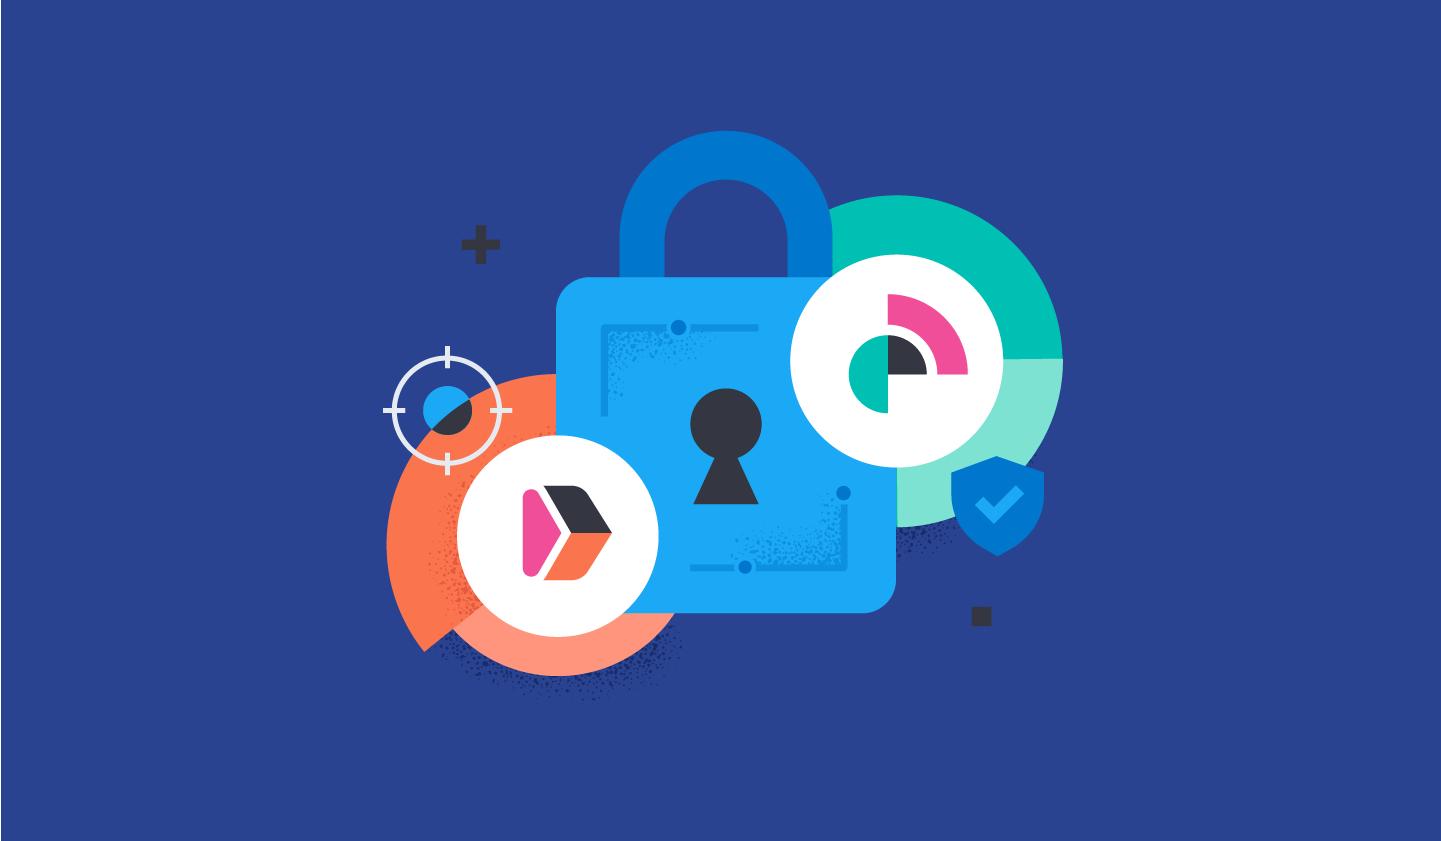 blog-thumb-security-logos-lock.png